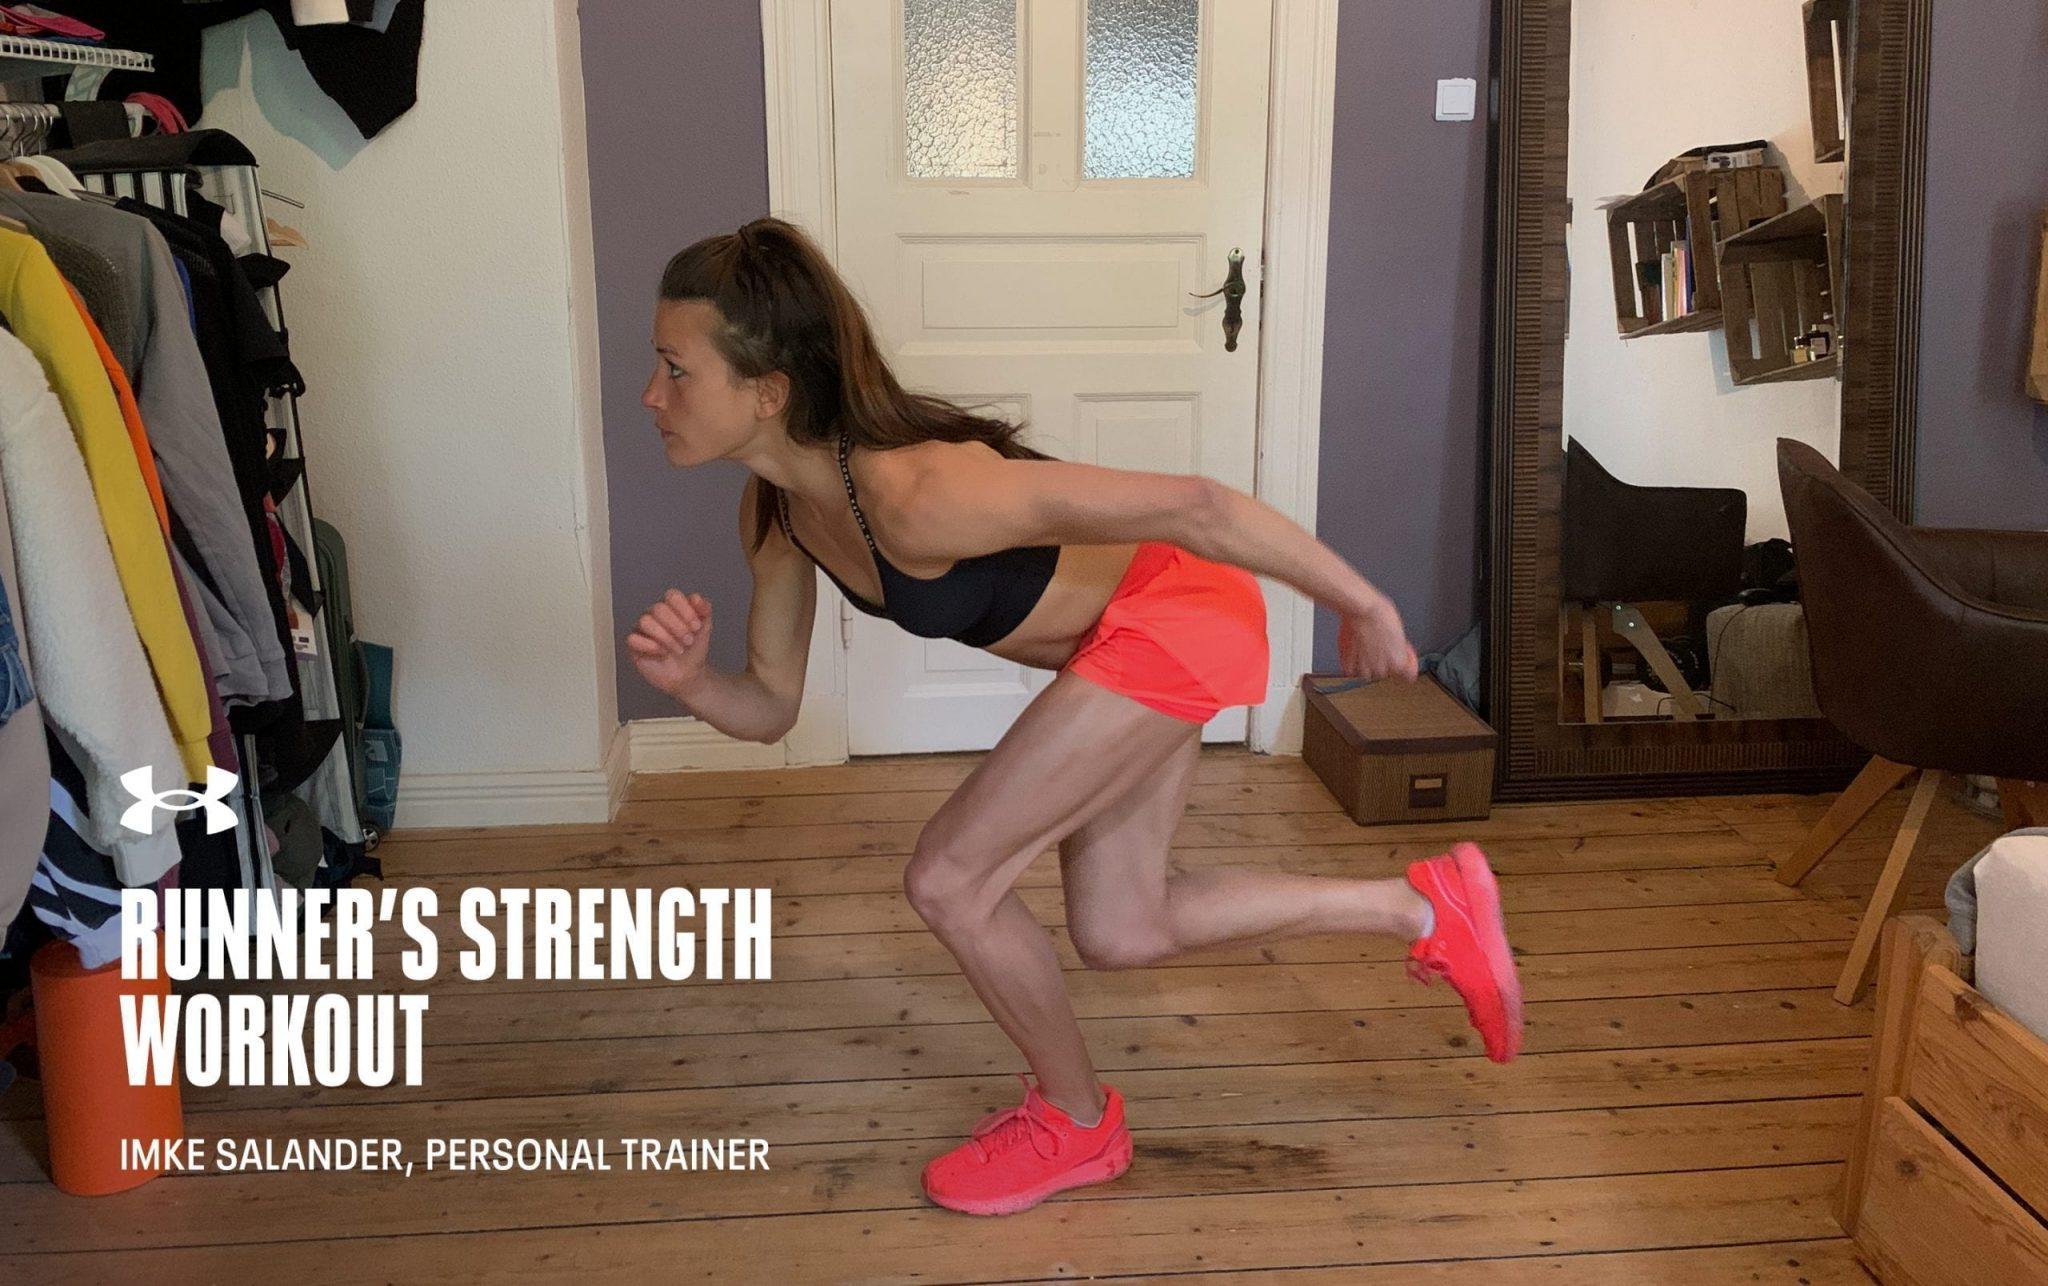 Runner's 30 Minute Strength Workout